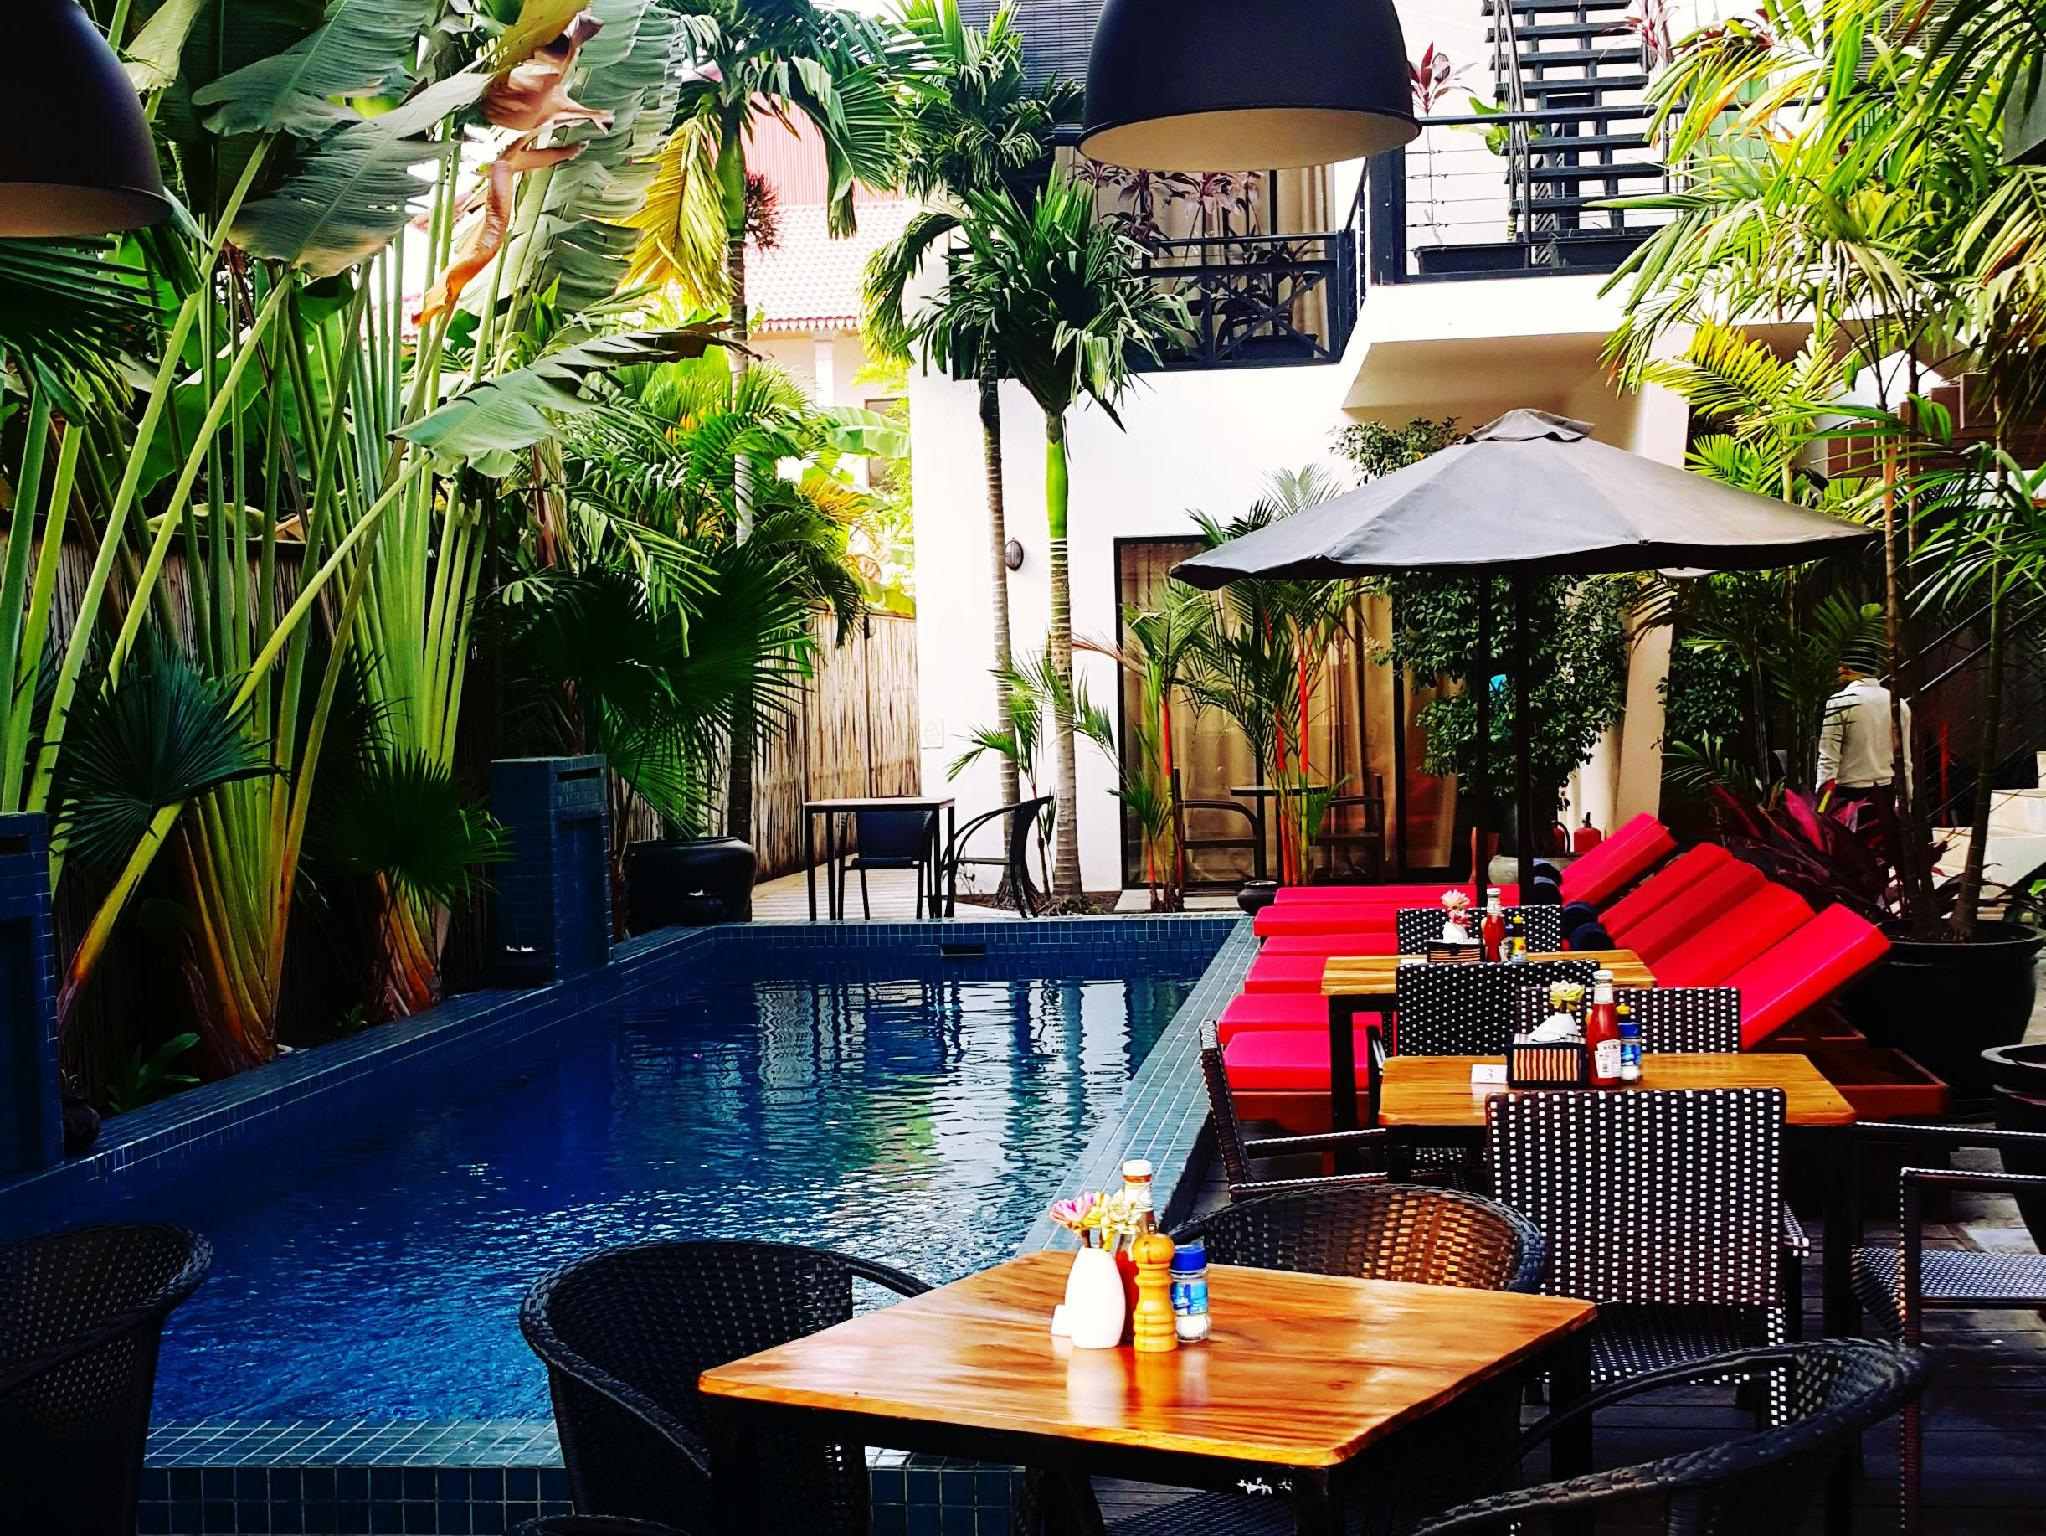 Pippeli Boutique Hotel Siem Reap